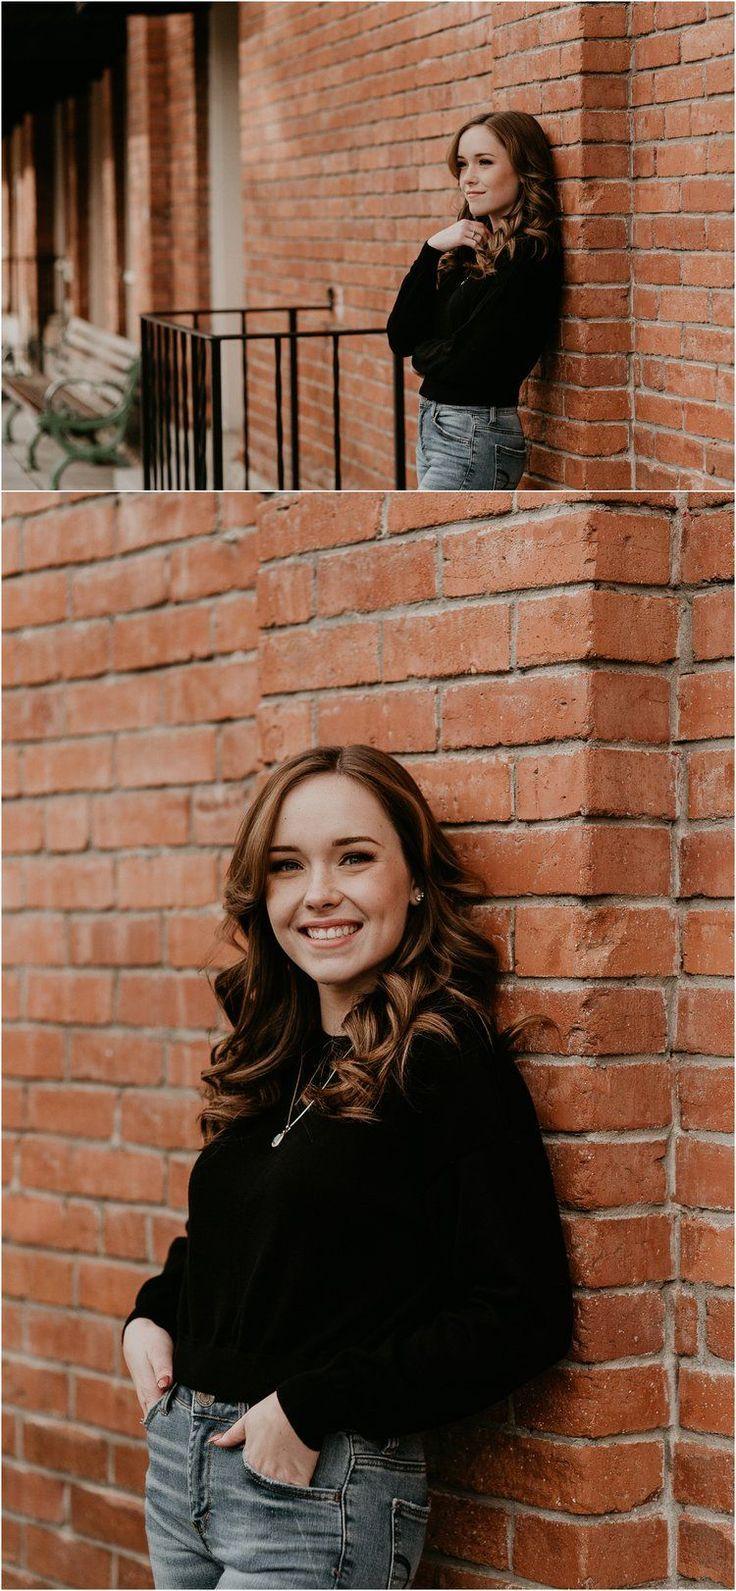 Danielle // Kuna High School Class of 2018, Downtown Boise